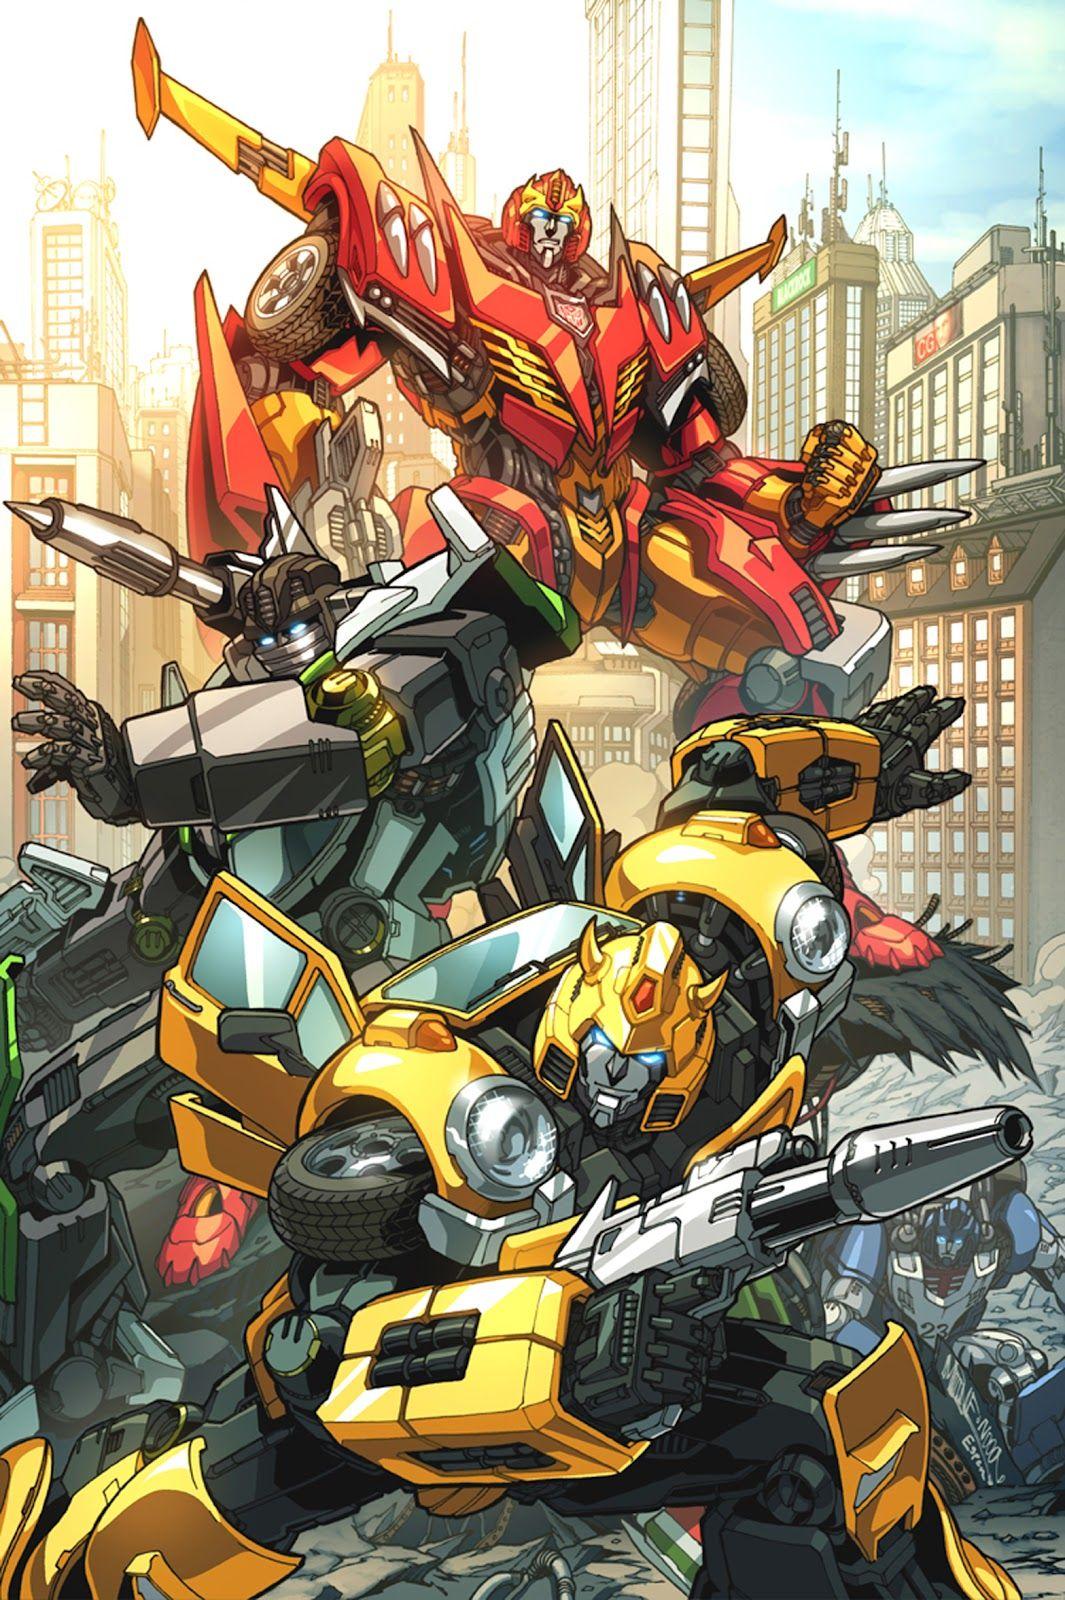 Transformers Fall Of Cybertron Autobots Poster Wallpaper Hotrod Hot Rod Bumblebee Ratchet Ironhide Transformers Artwork Transformers Art Transformers Autobots